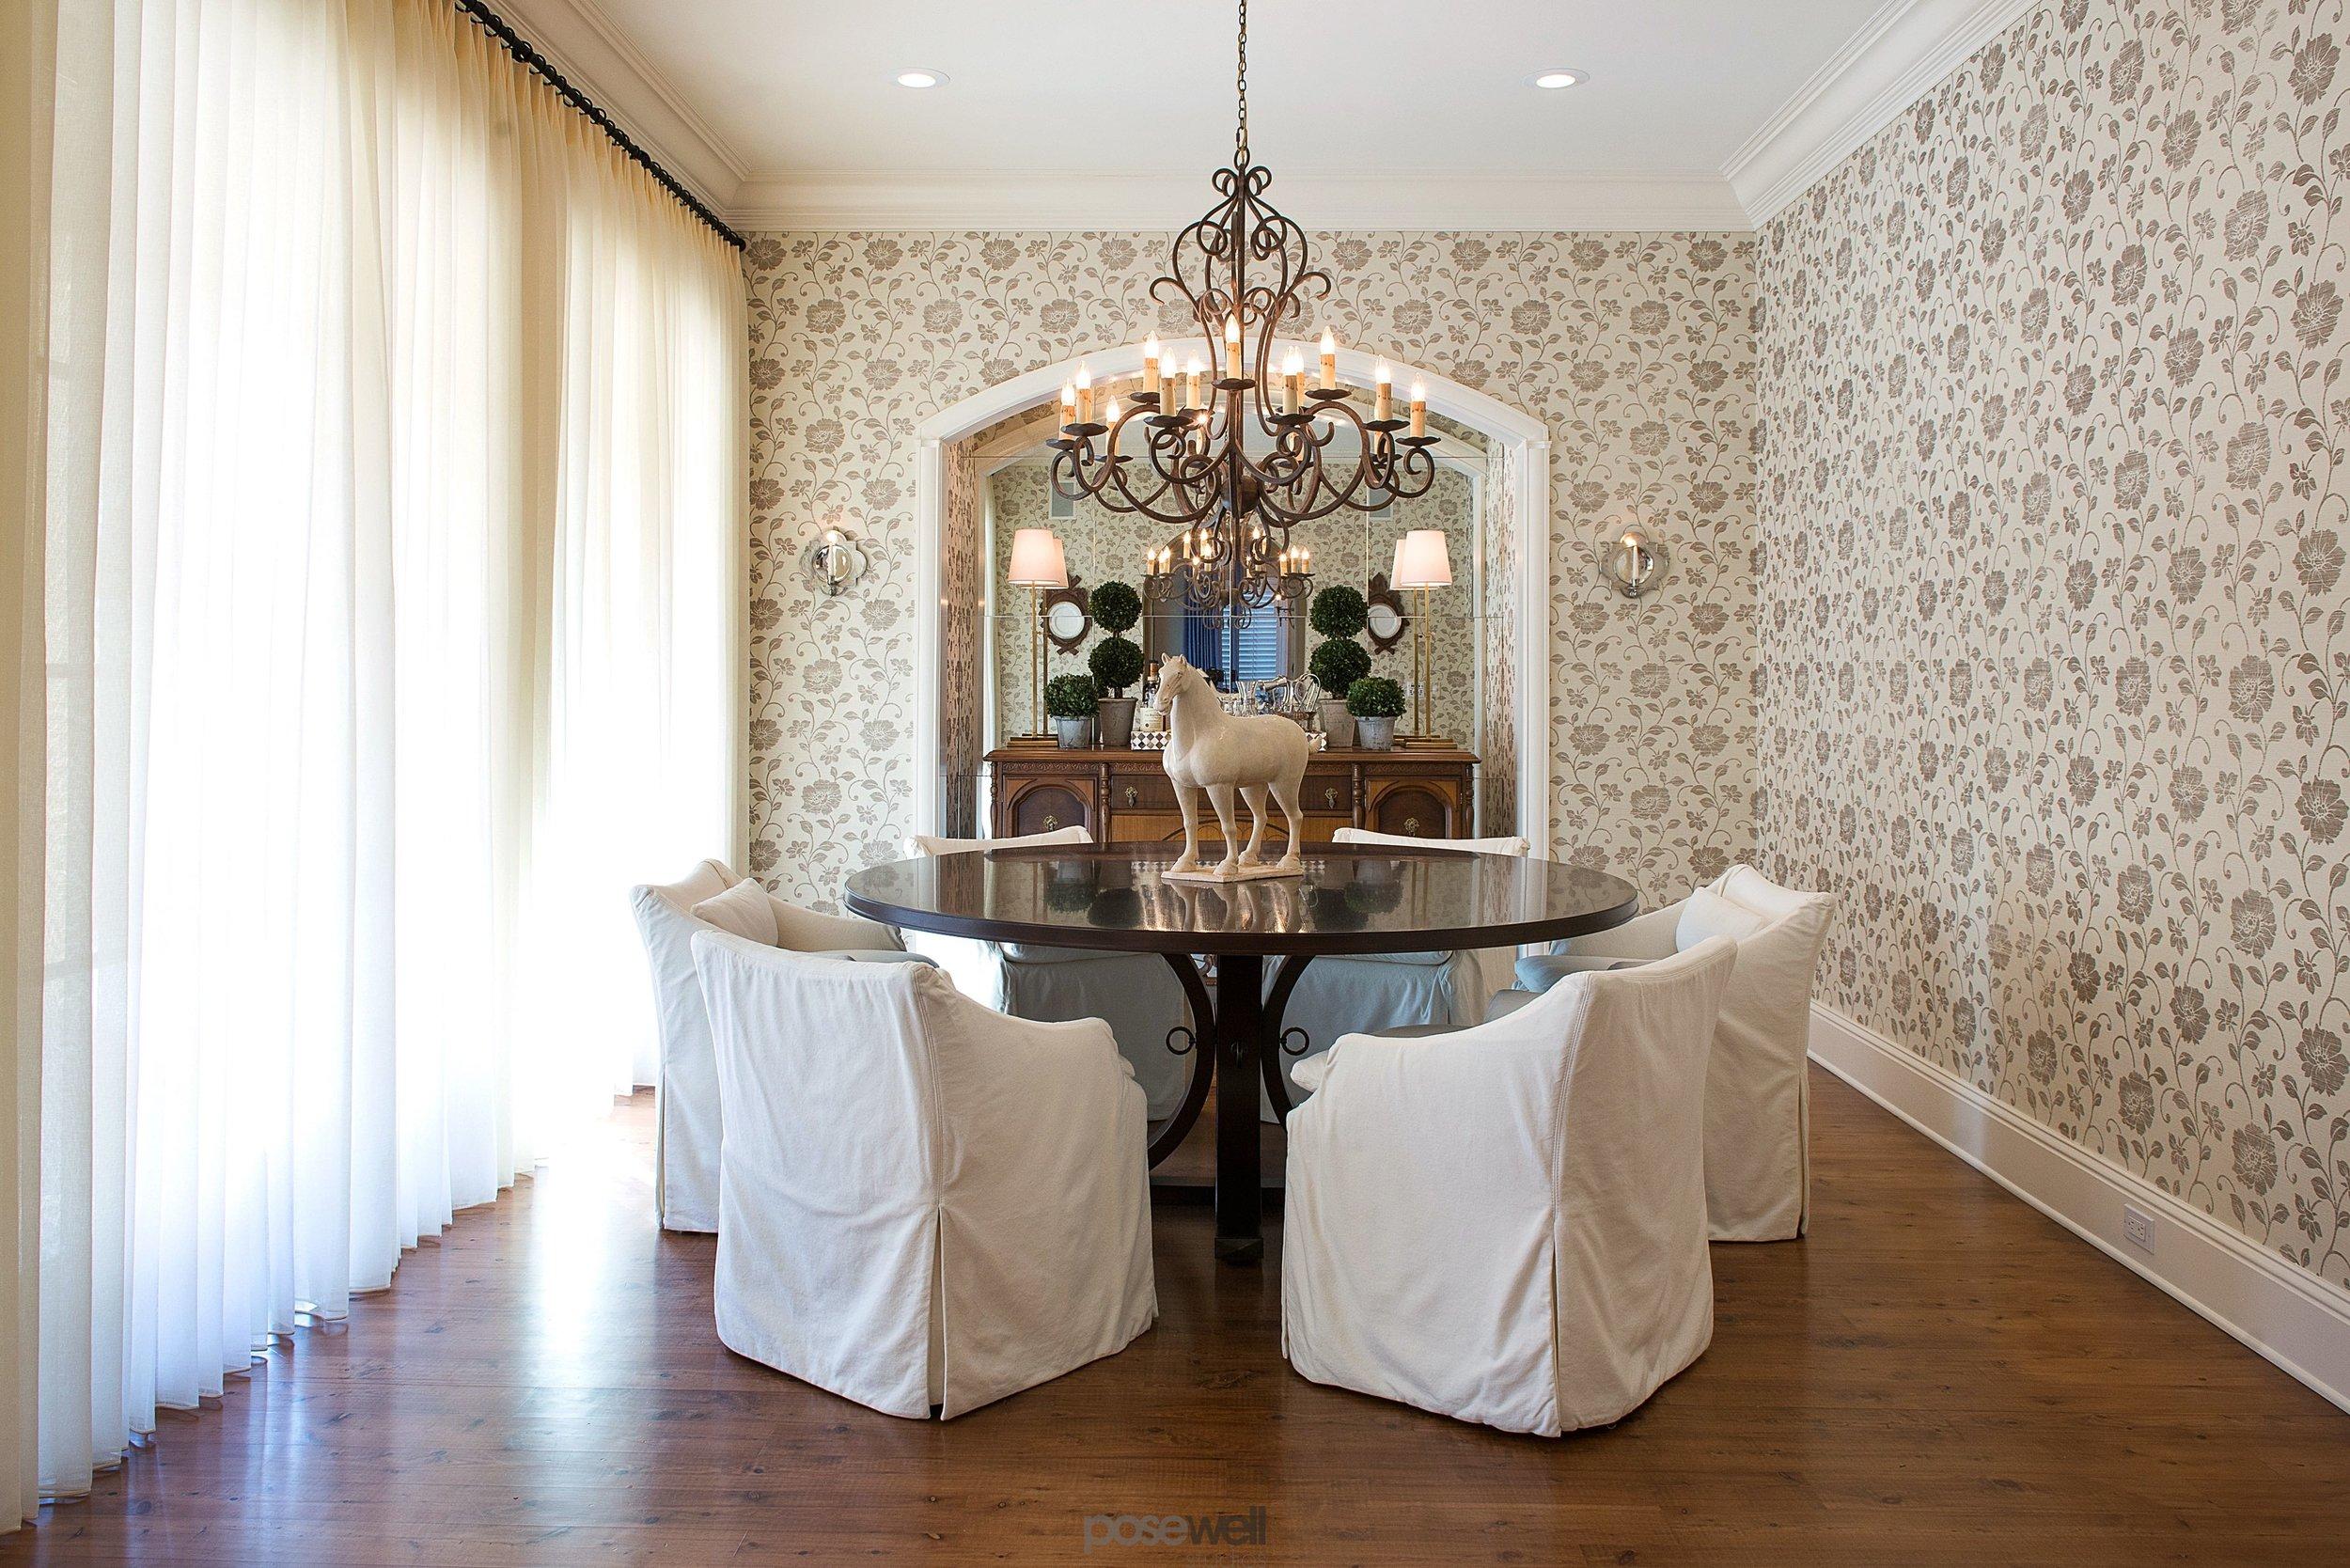 11.Dining Room After.jpeg